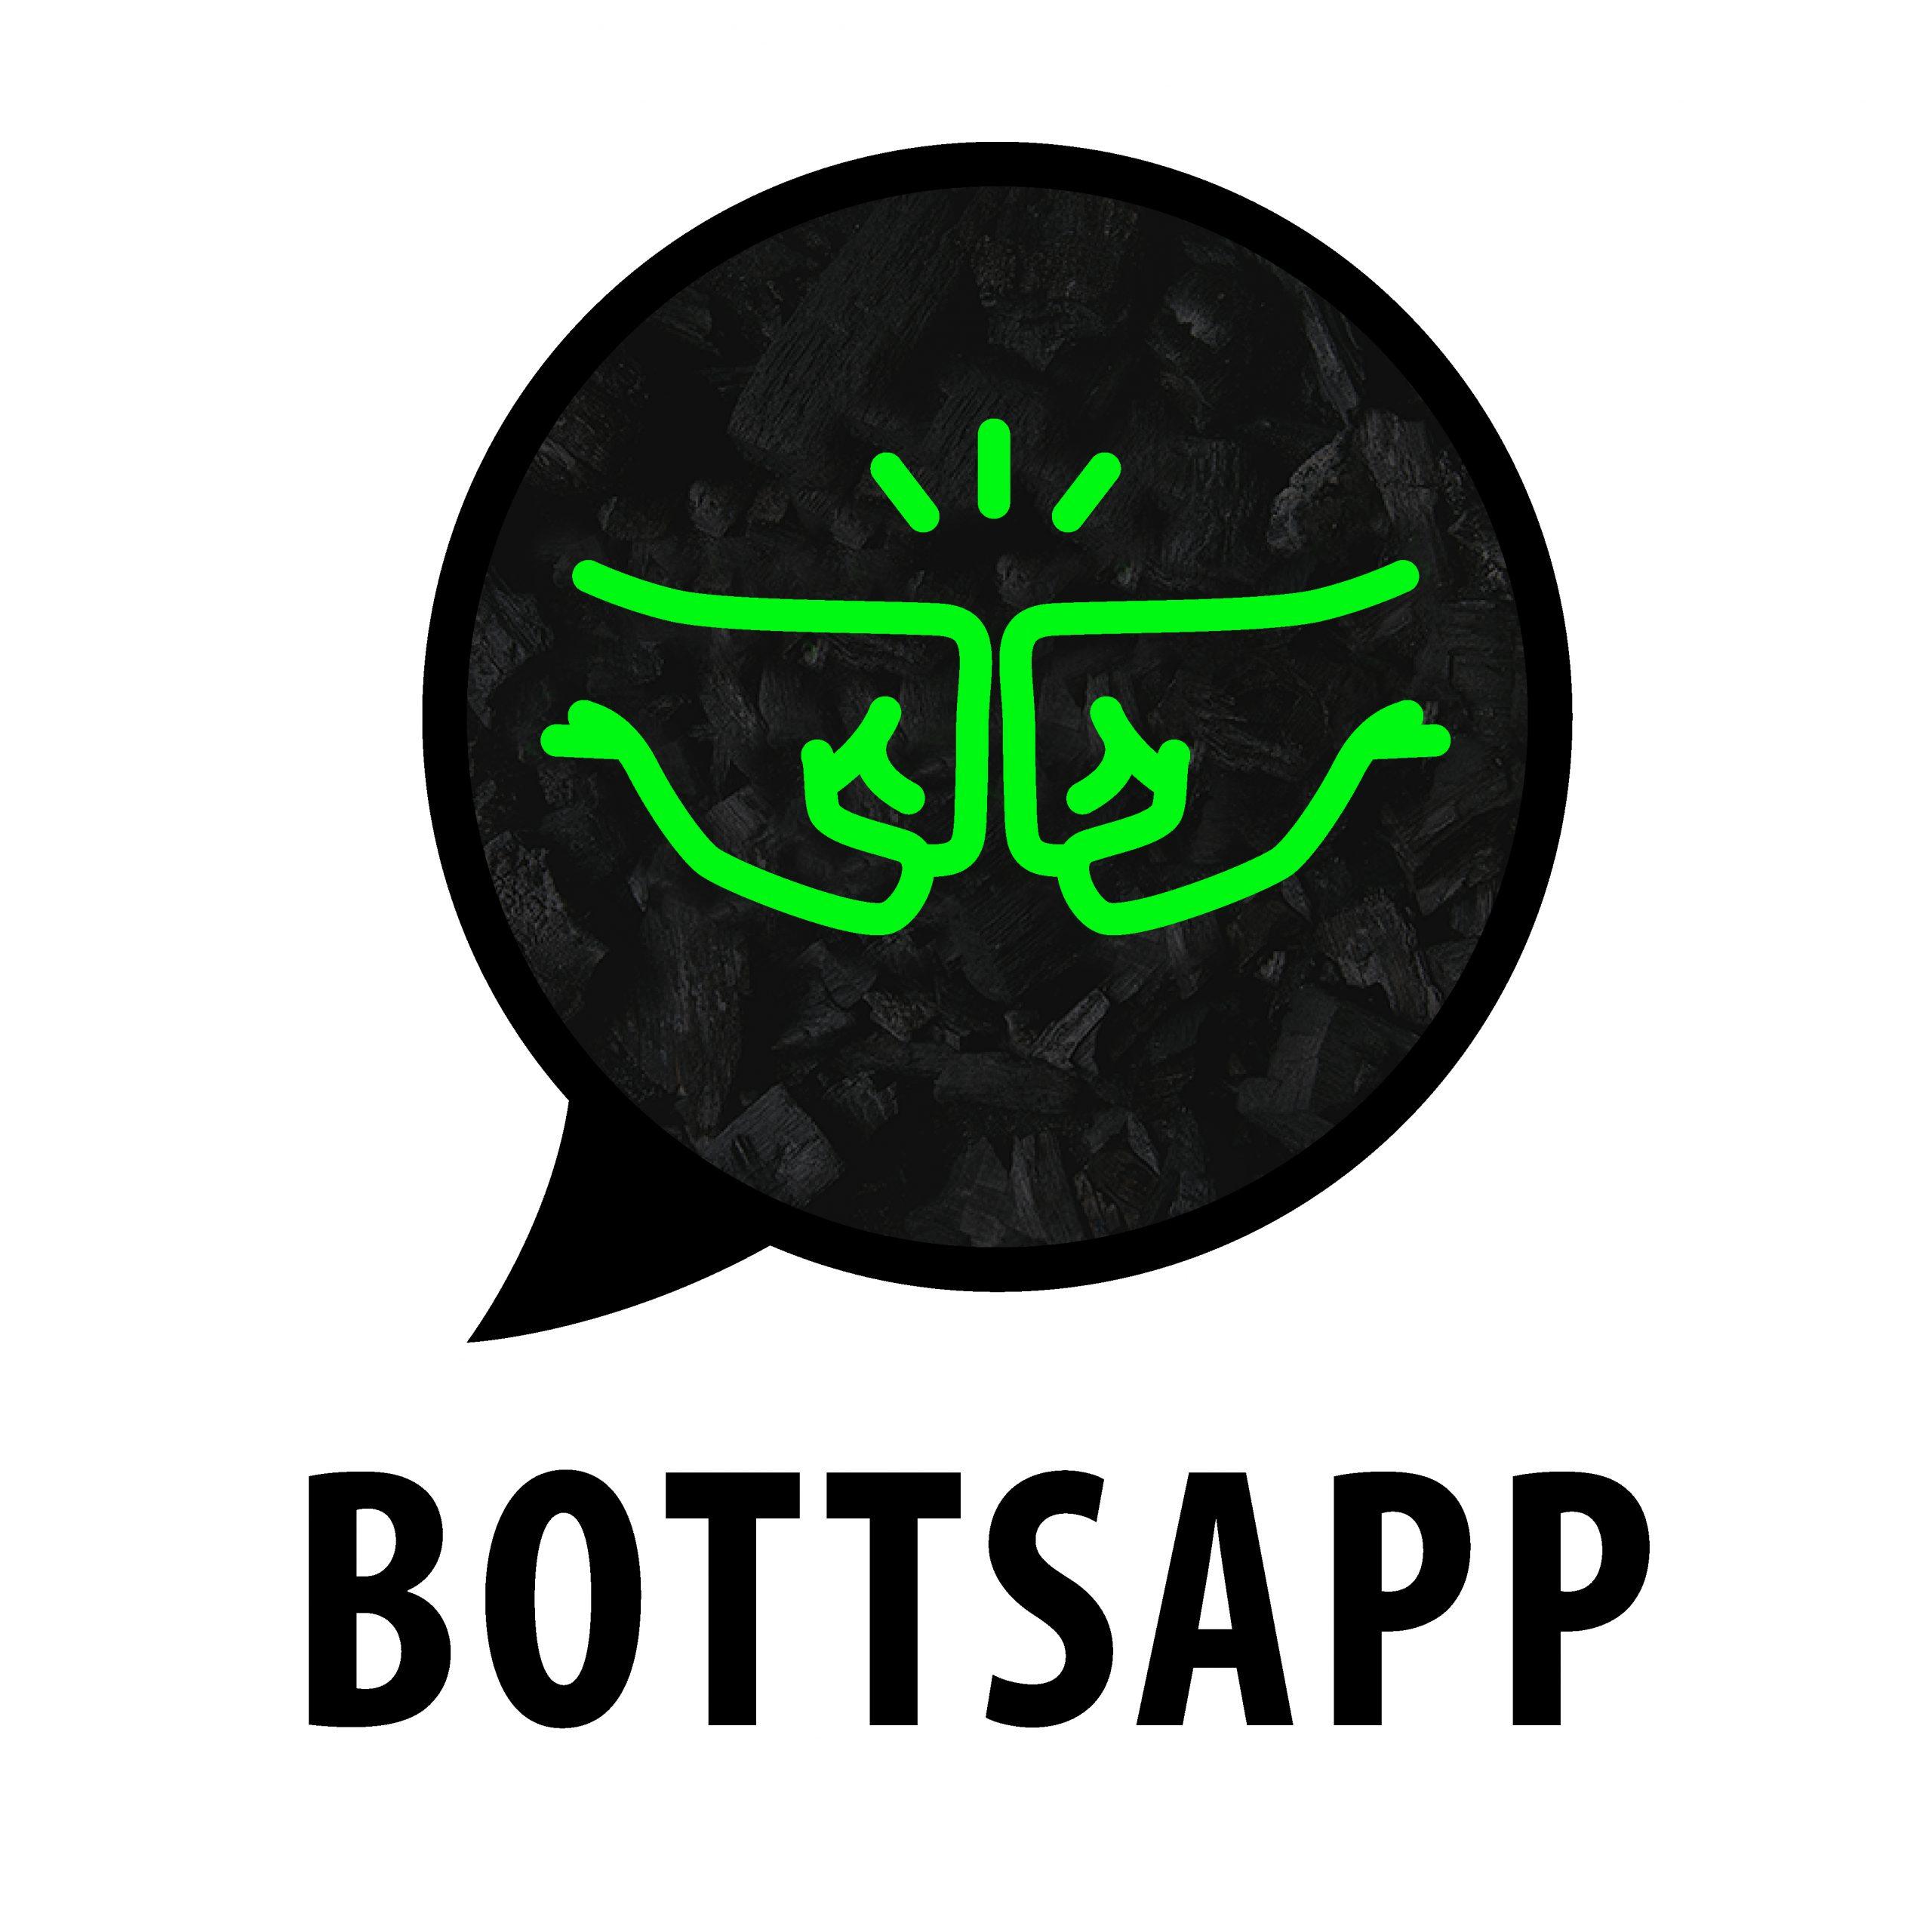 Bottsapp-Logo ohne .de